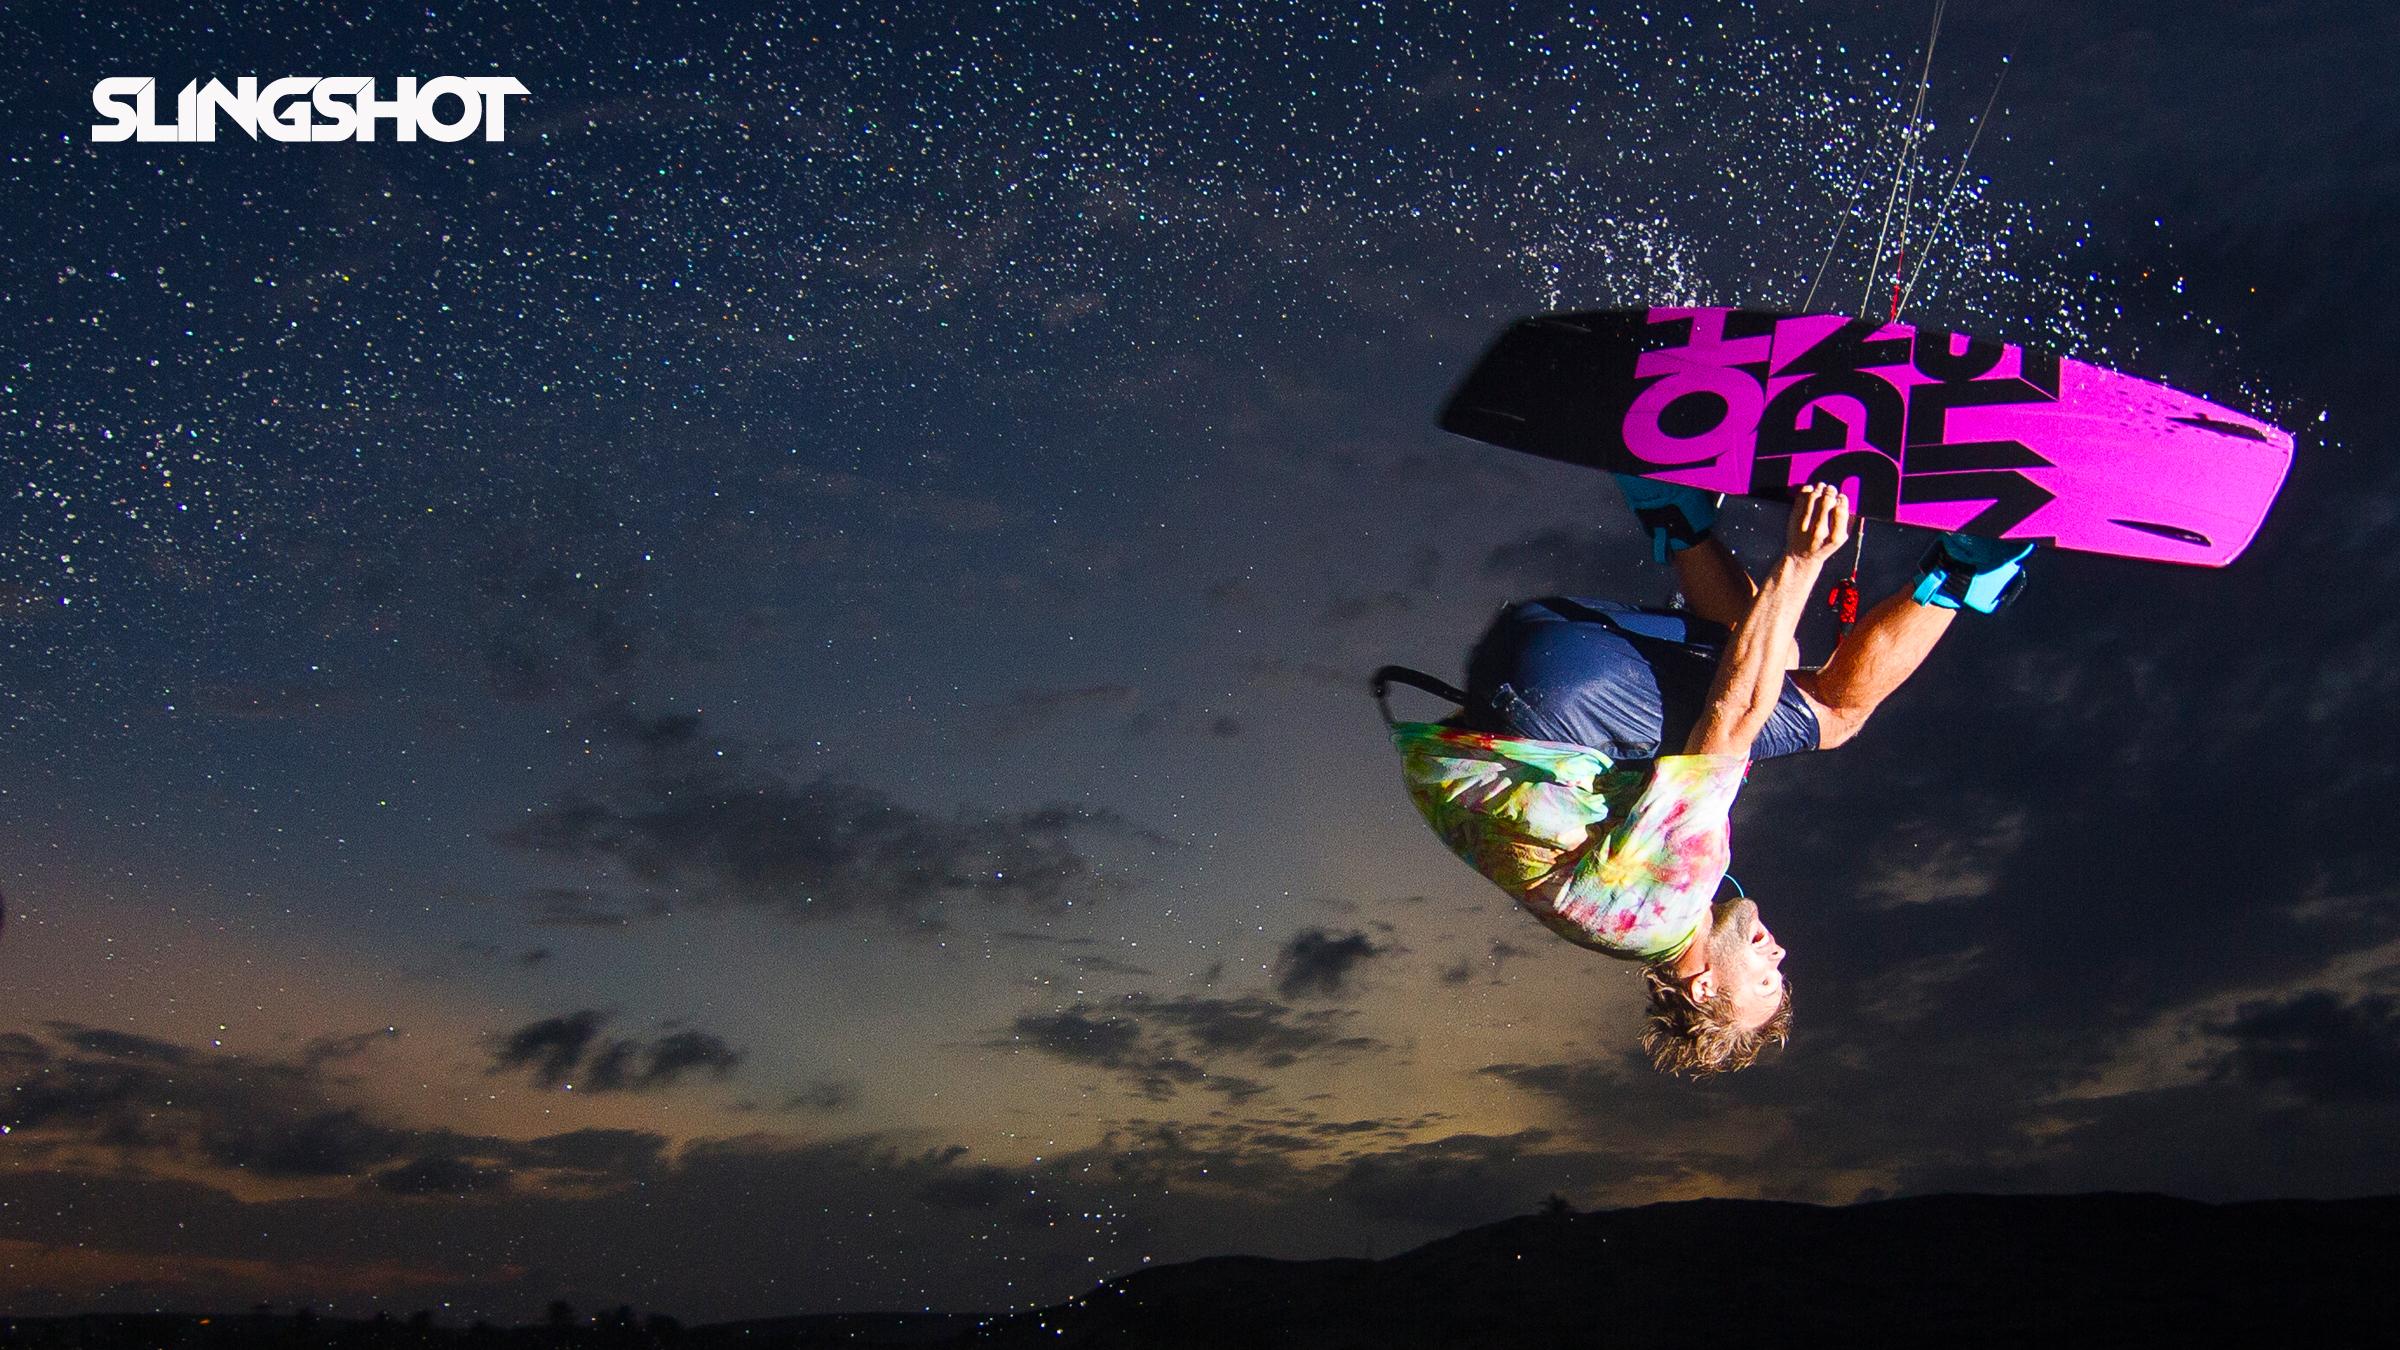 kitesurf wallpaper image - Sam Light on the 2015 Slingshot asylum board. Inverted with a grab kitesurfing. - in resolution: High Definition - HD 16:9 2400 X 1350